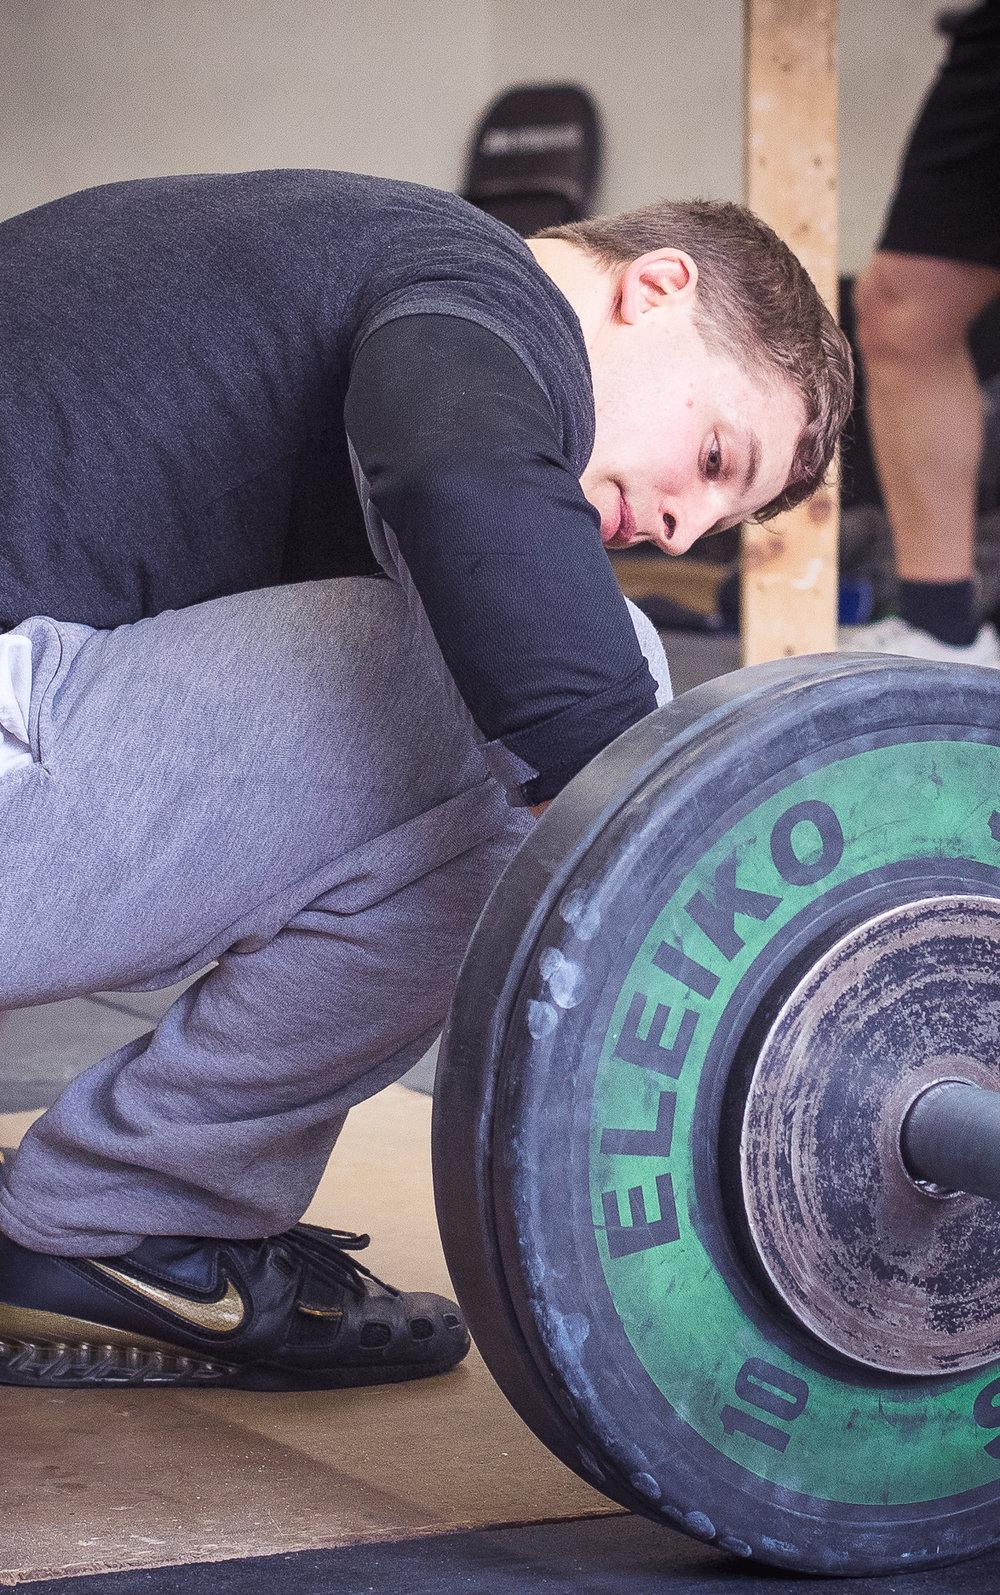 dan-casey-nywa-jdi-visit-weightlifting-coach-new-york-weightlifting-academy-9 2.jpg